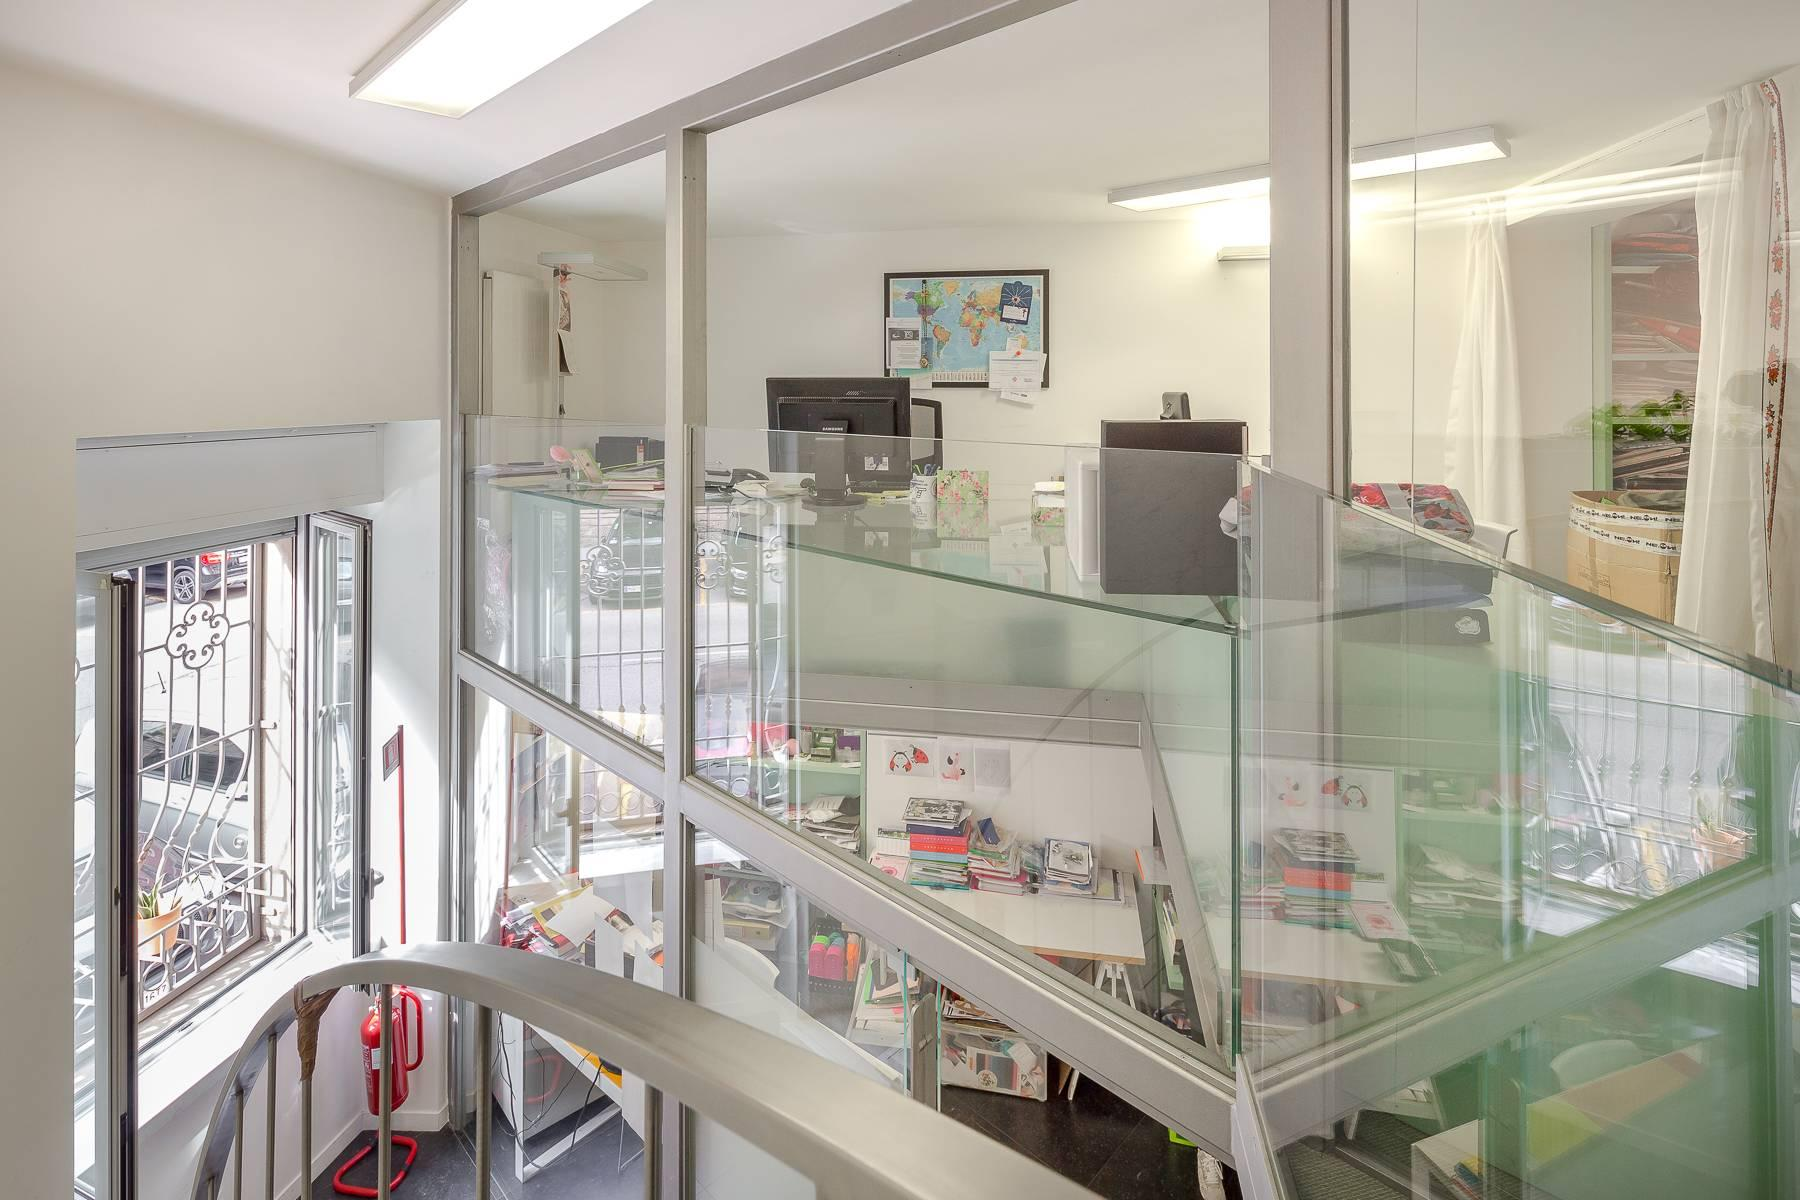 Open space office/residential property in Piazza Giovine Italia/Via Aurelio Saffi - 17